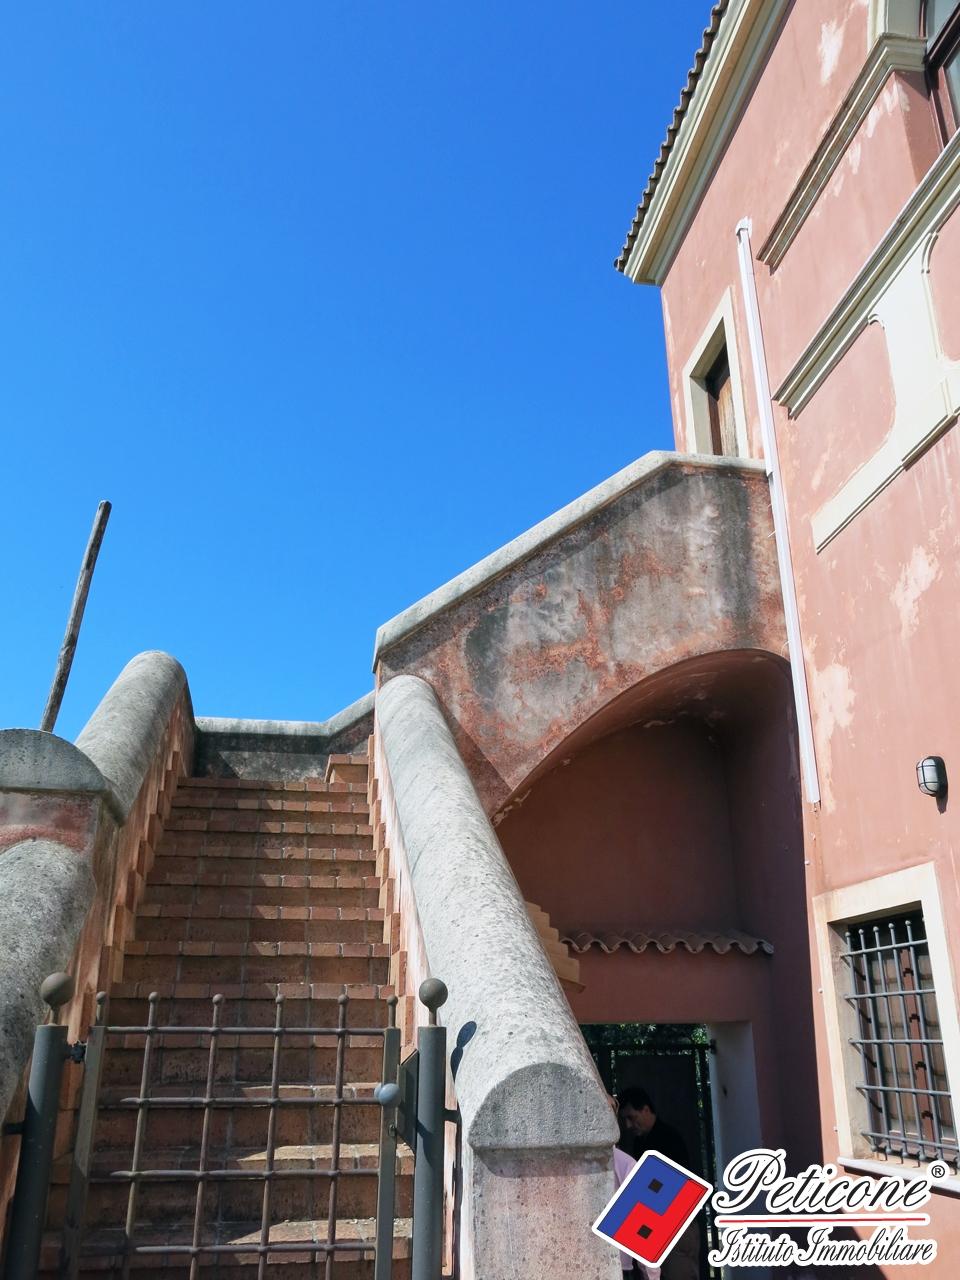 Villa in Vendita a Gaeta: 5 locali, 250 mq - Foto 24